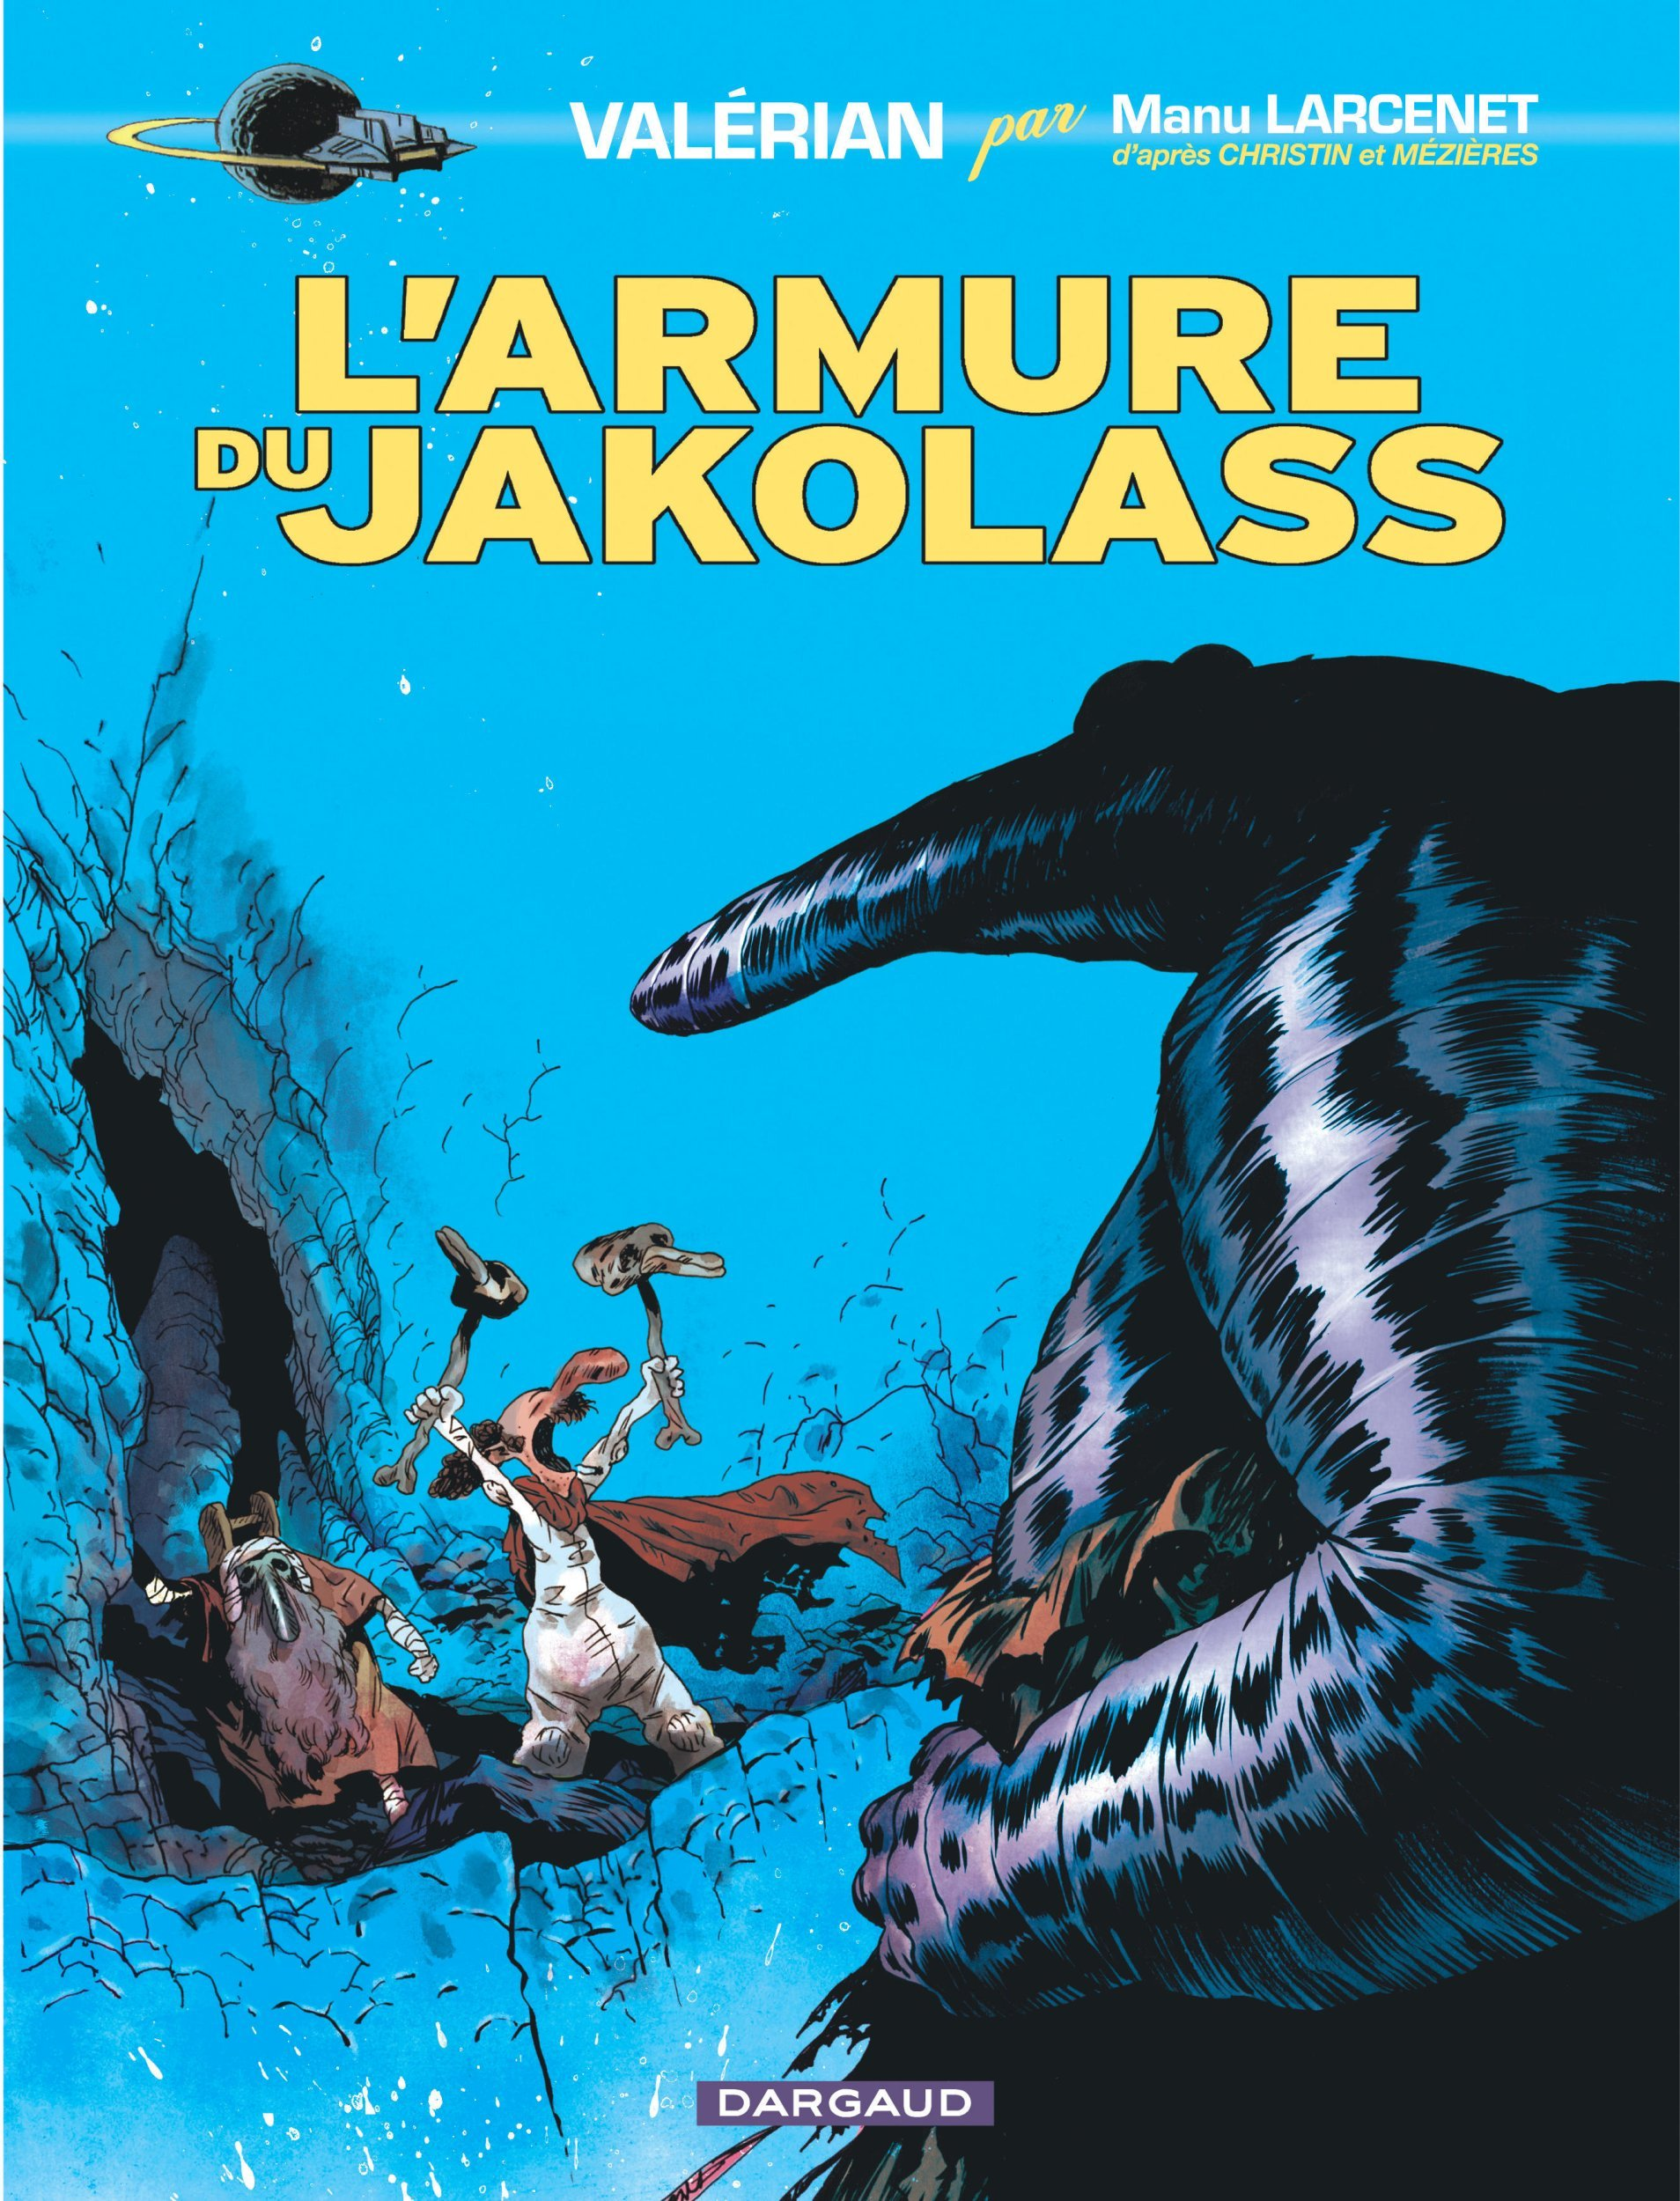 VALERIAN, VU PAR... - TOME 1 - L'ARMURE DU JAKOLASS (1)